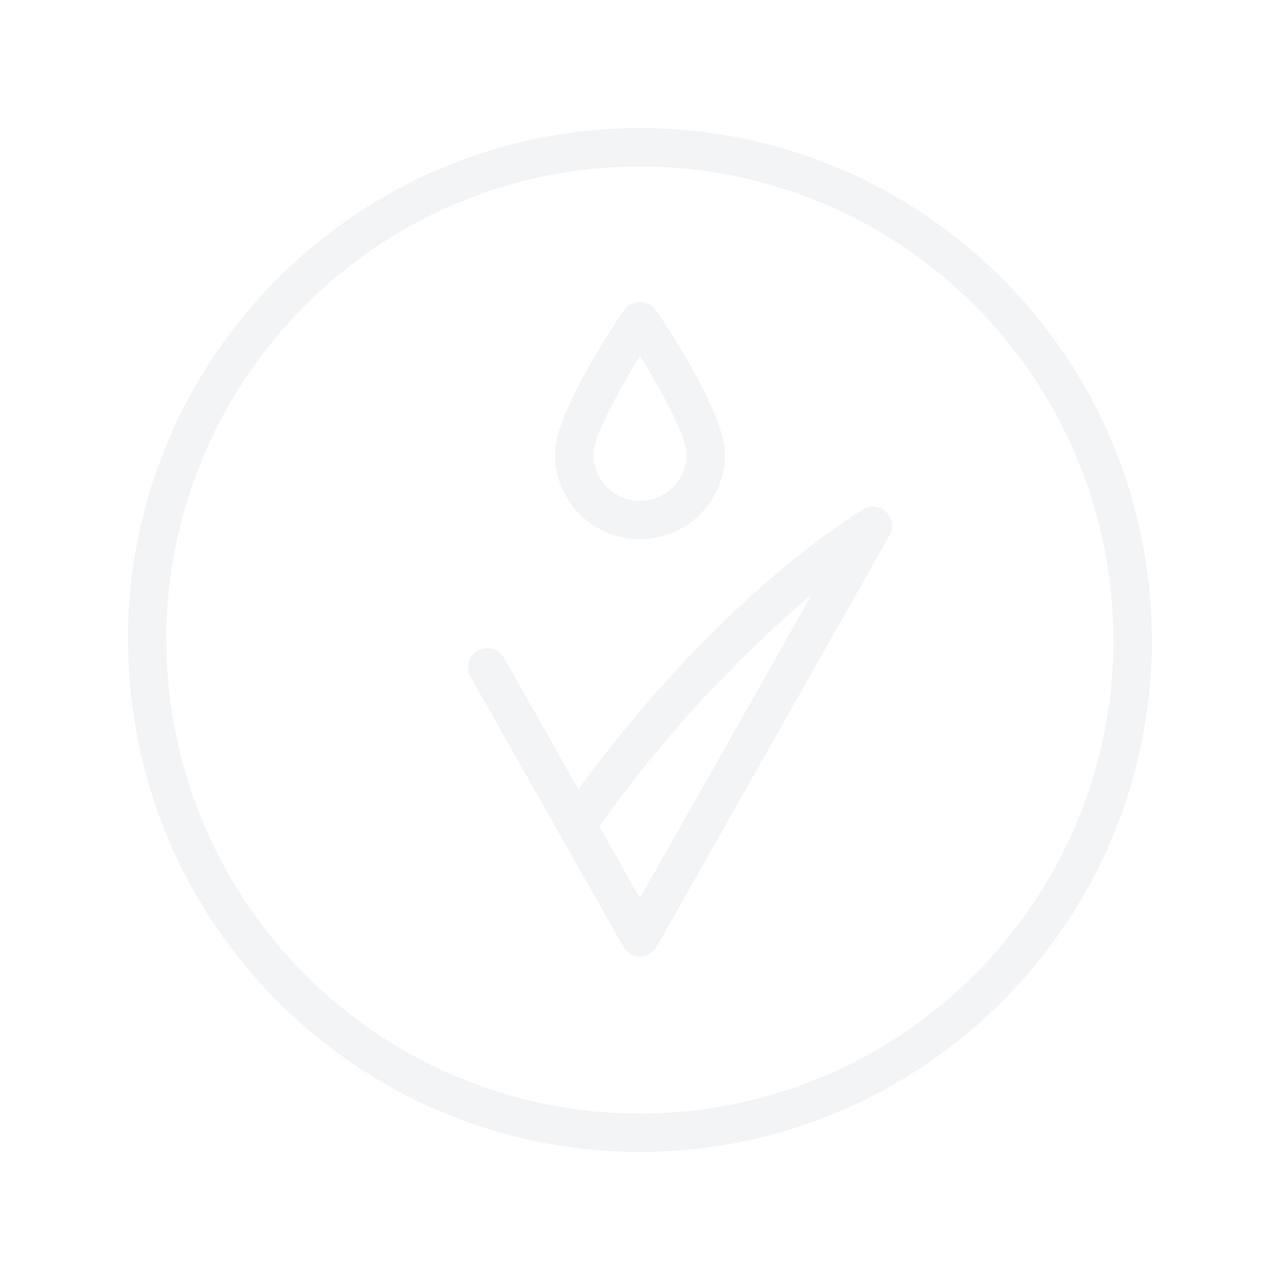 WELLA PROFESSIONALS Invigo Volume Bodifying Shampoo 1000ml